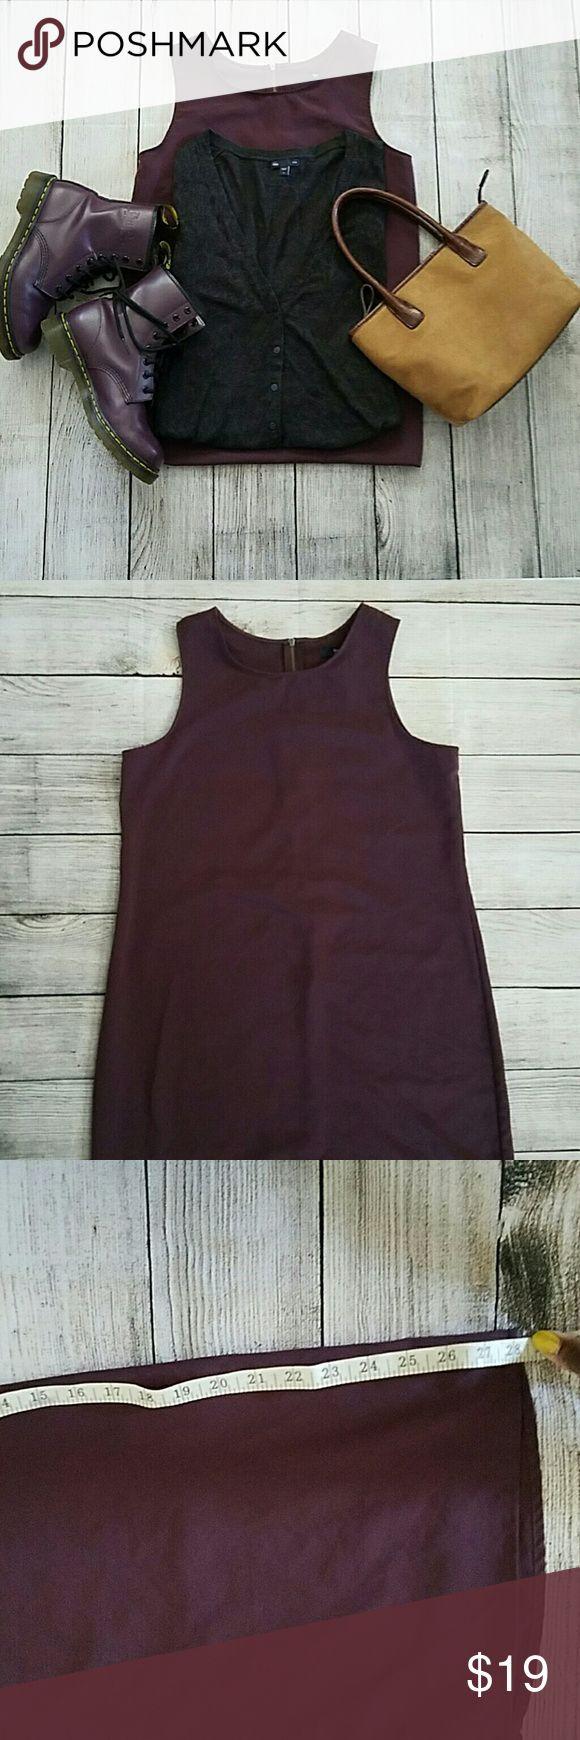 Plum Gap sleeveless sheath dress Gorgeous plum color sheath dress. A great closet staple for layering and business casual! GAP Dresses